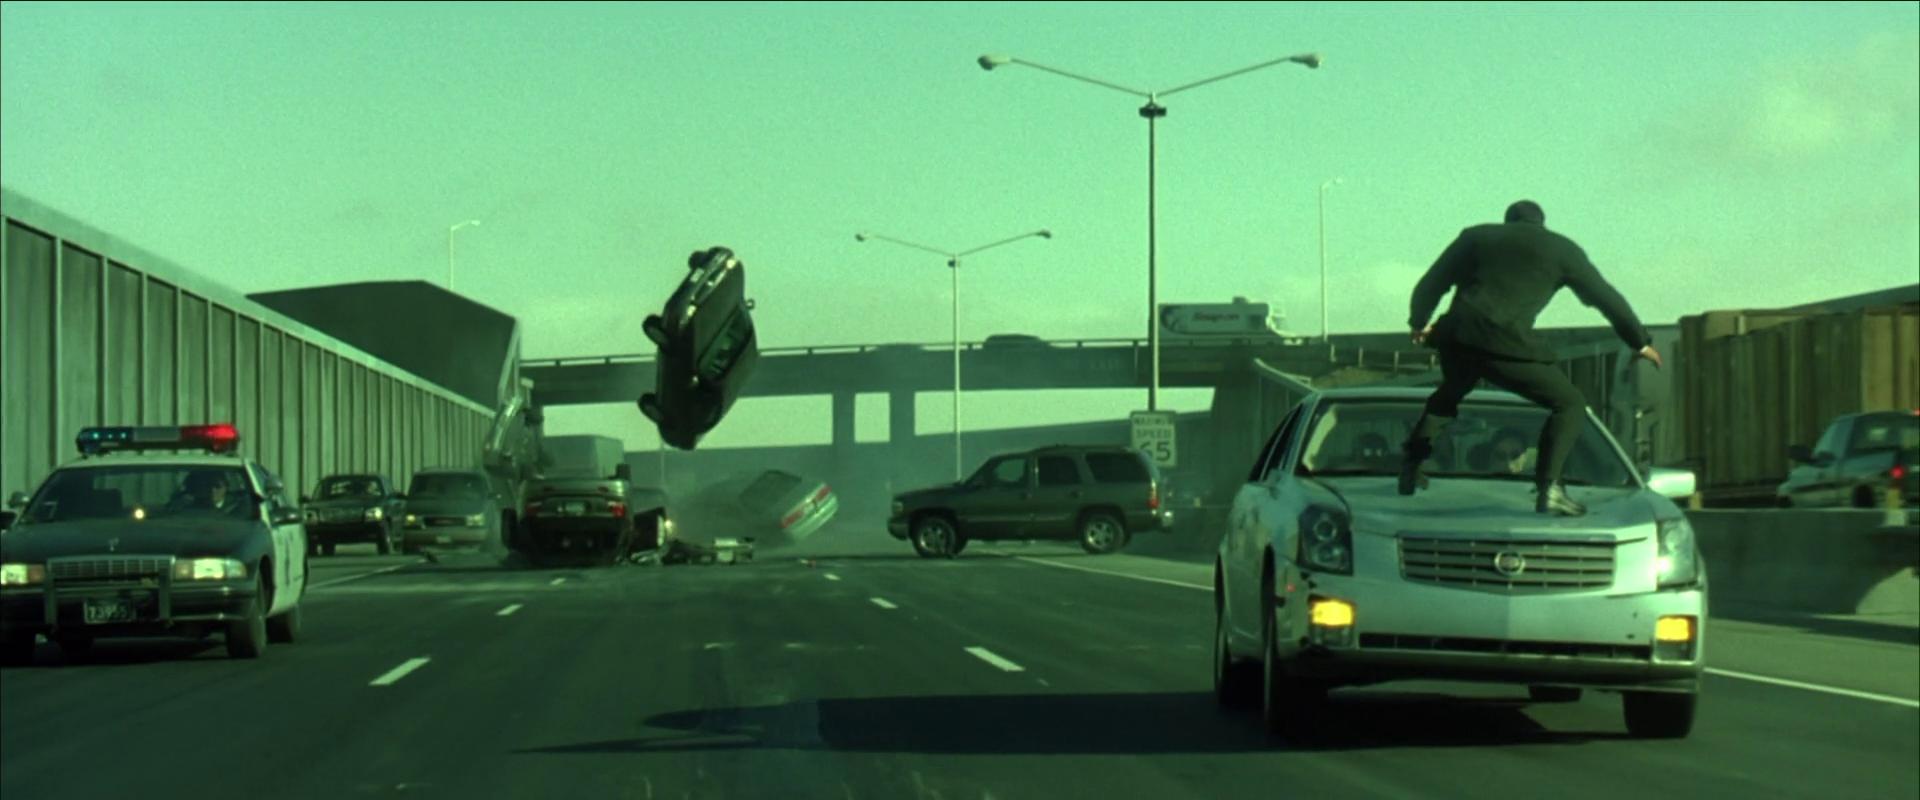 My favorite scene the matrix reloaded 2003 freeway for Matrix reloaded architect